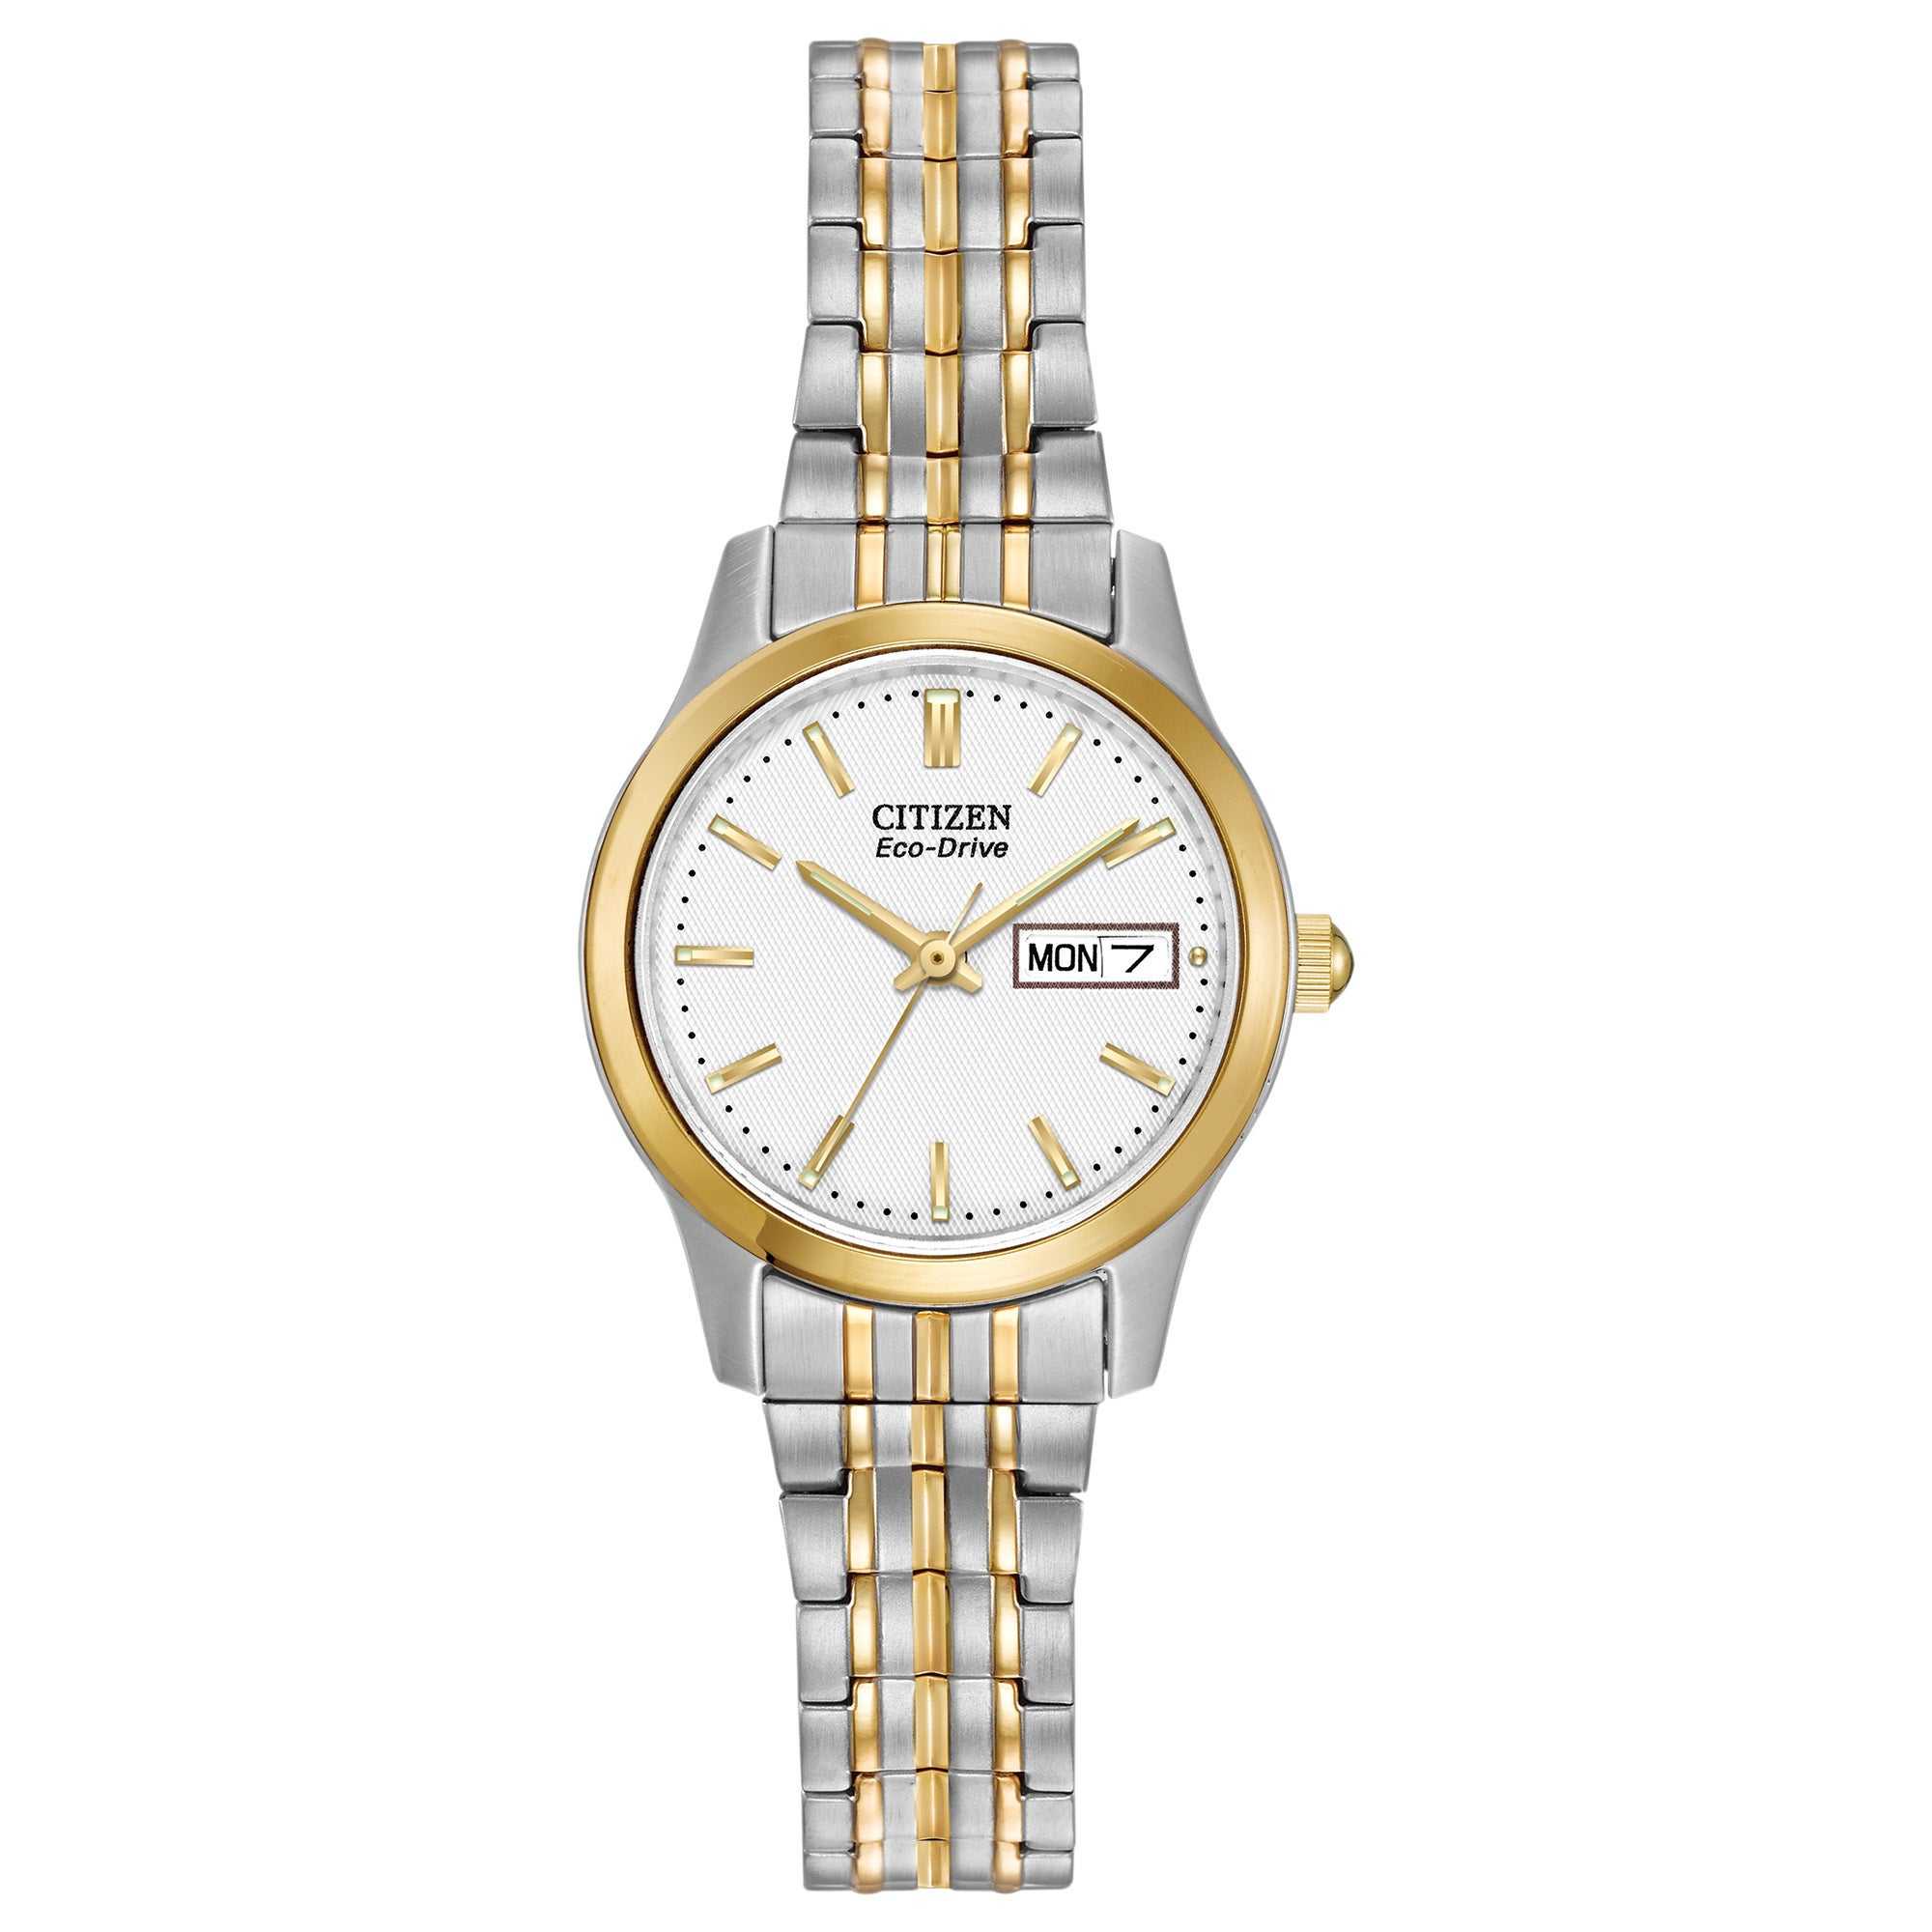 Citizen Women's EW3154-90A Eco-Drive Bracelets Watch (Des...